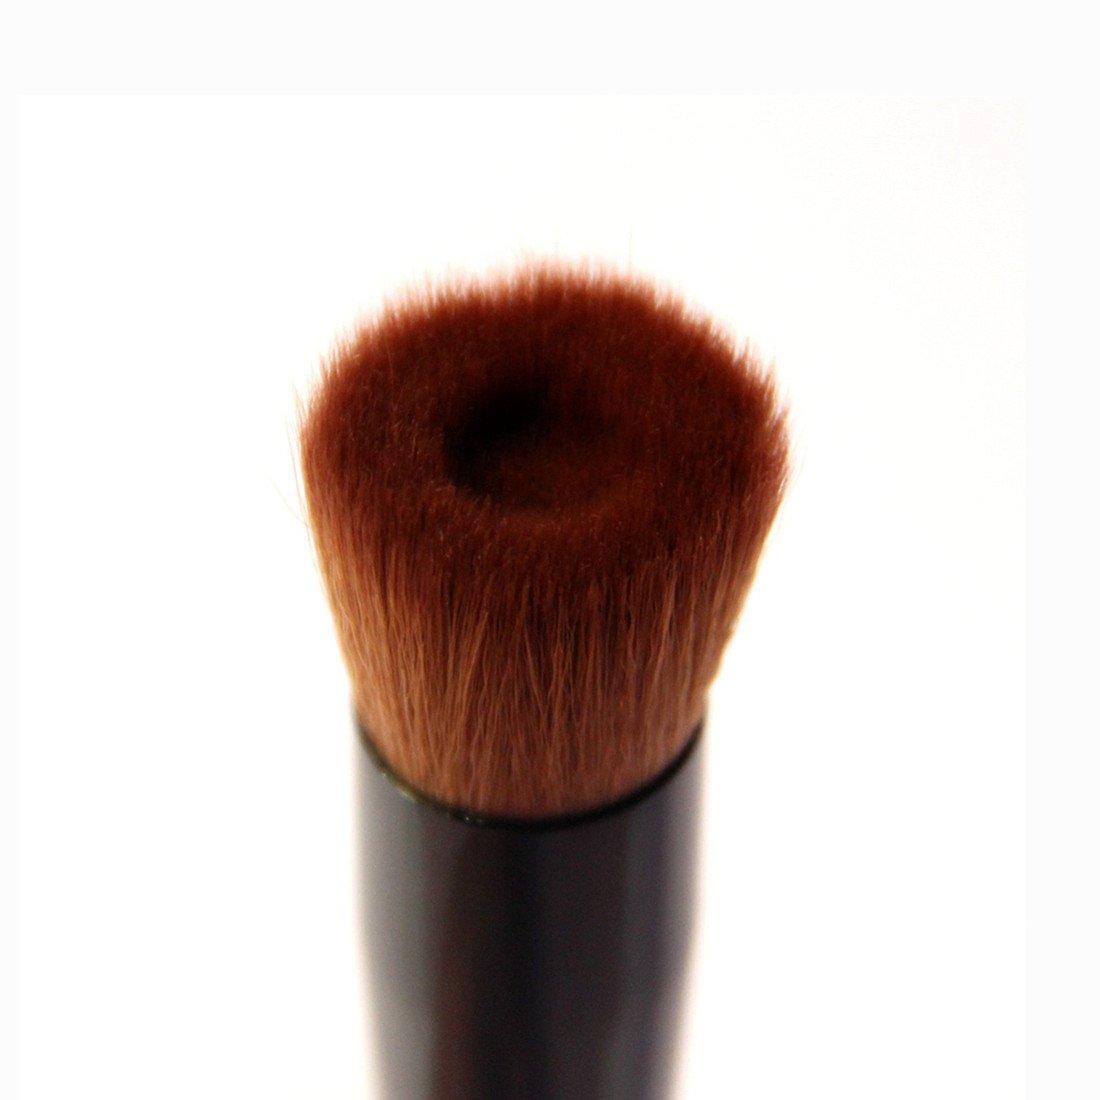 kabuki brush for liquid foundation. value makers makeup foundation powder brush - professional make up cosmetics tools liquid face blush contour kabuki for w